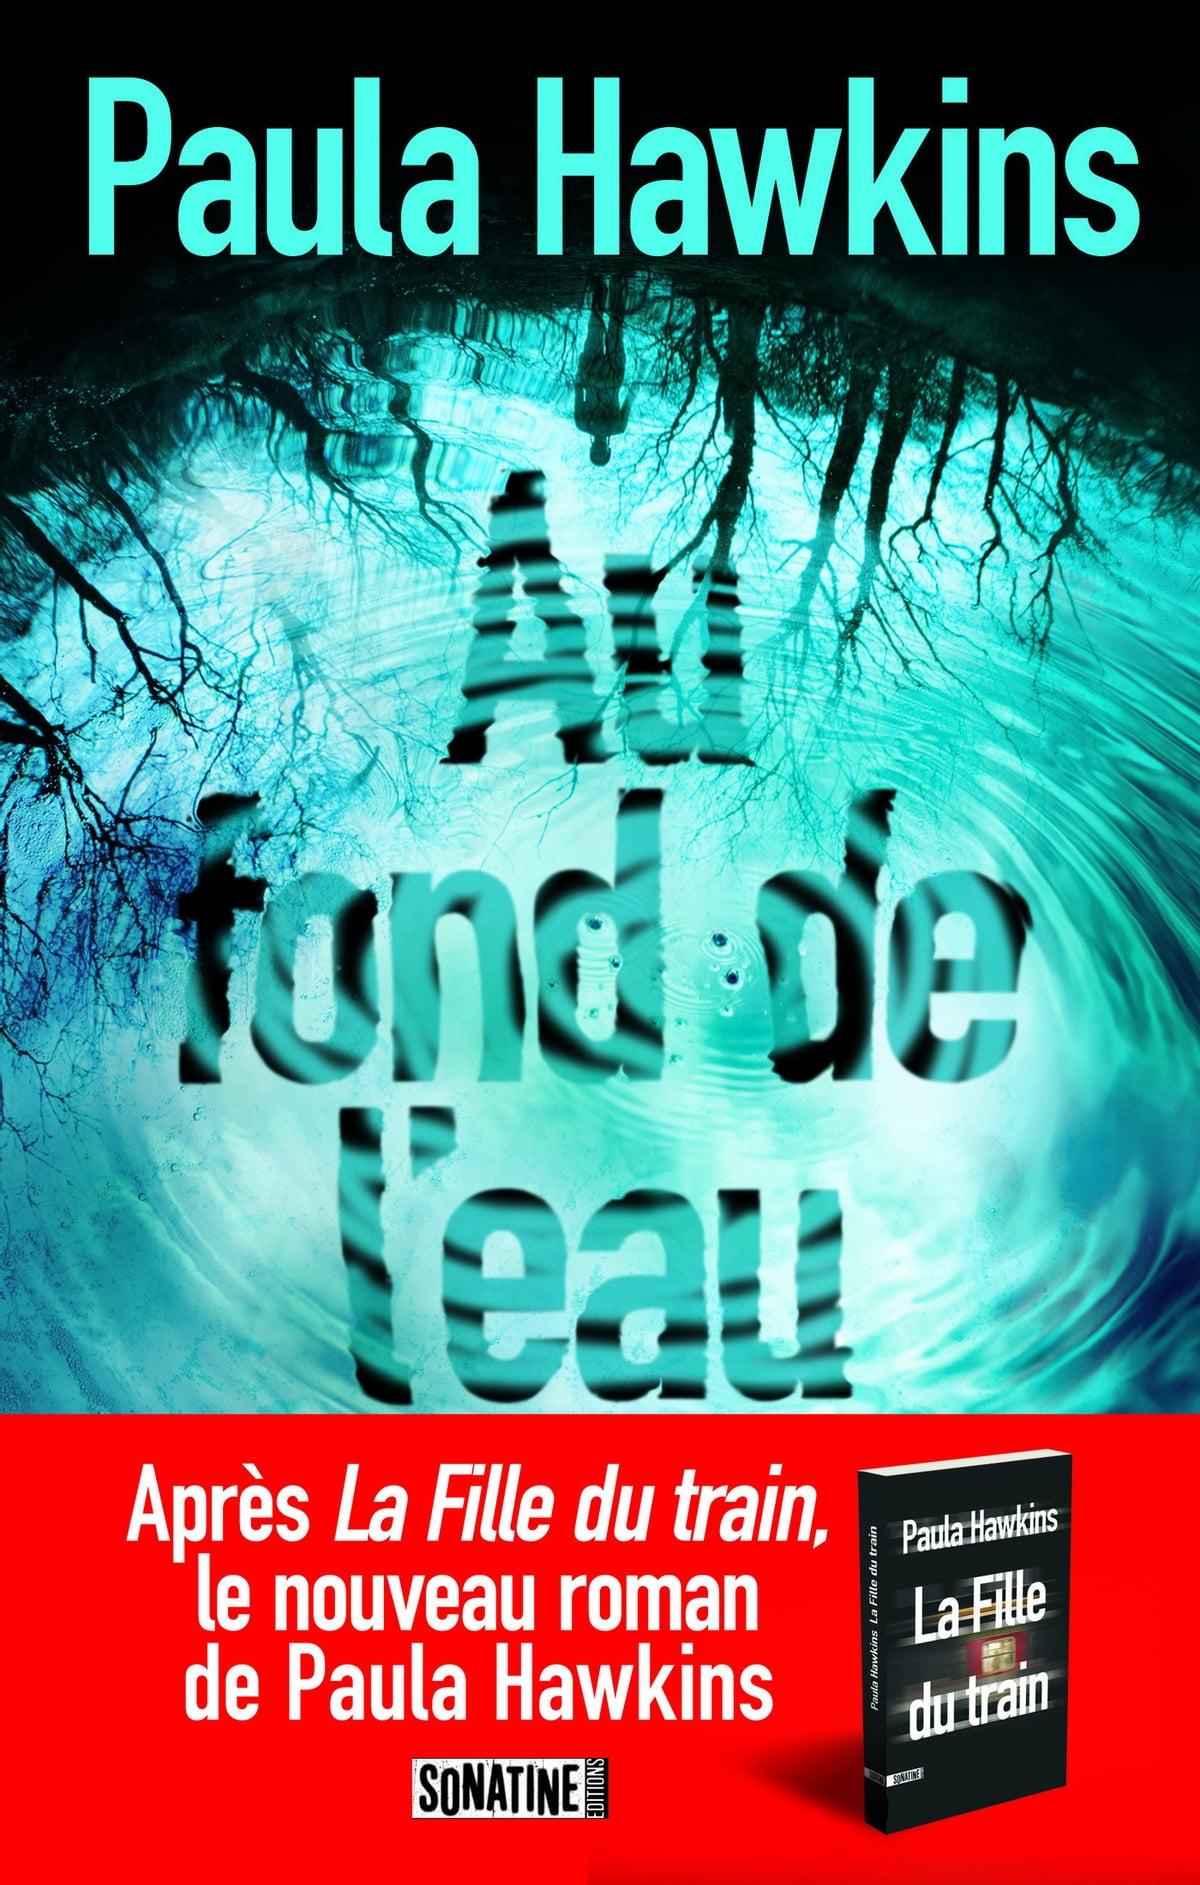 La Fille Du Train Epub : fille, train, L'eau, EBook, Paula, HAWKINS, 9782355846274, Rakuten, United, States